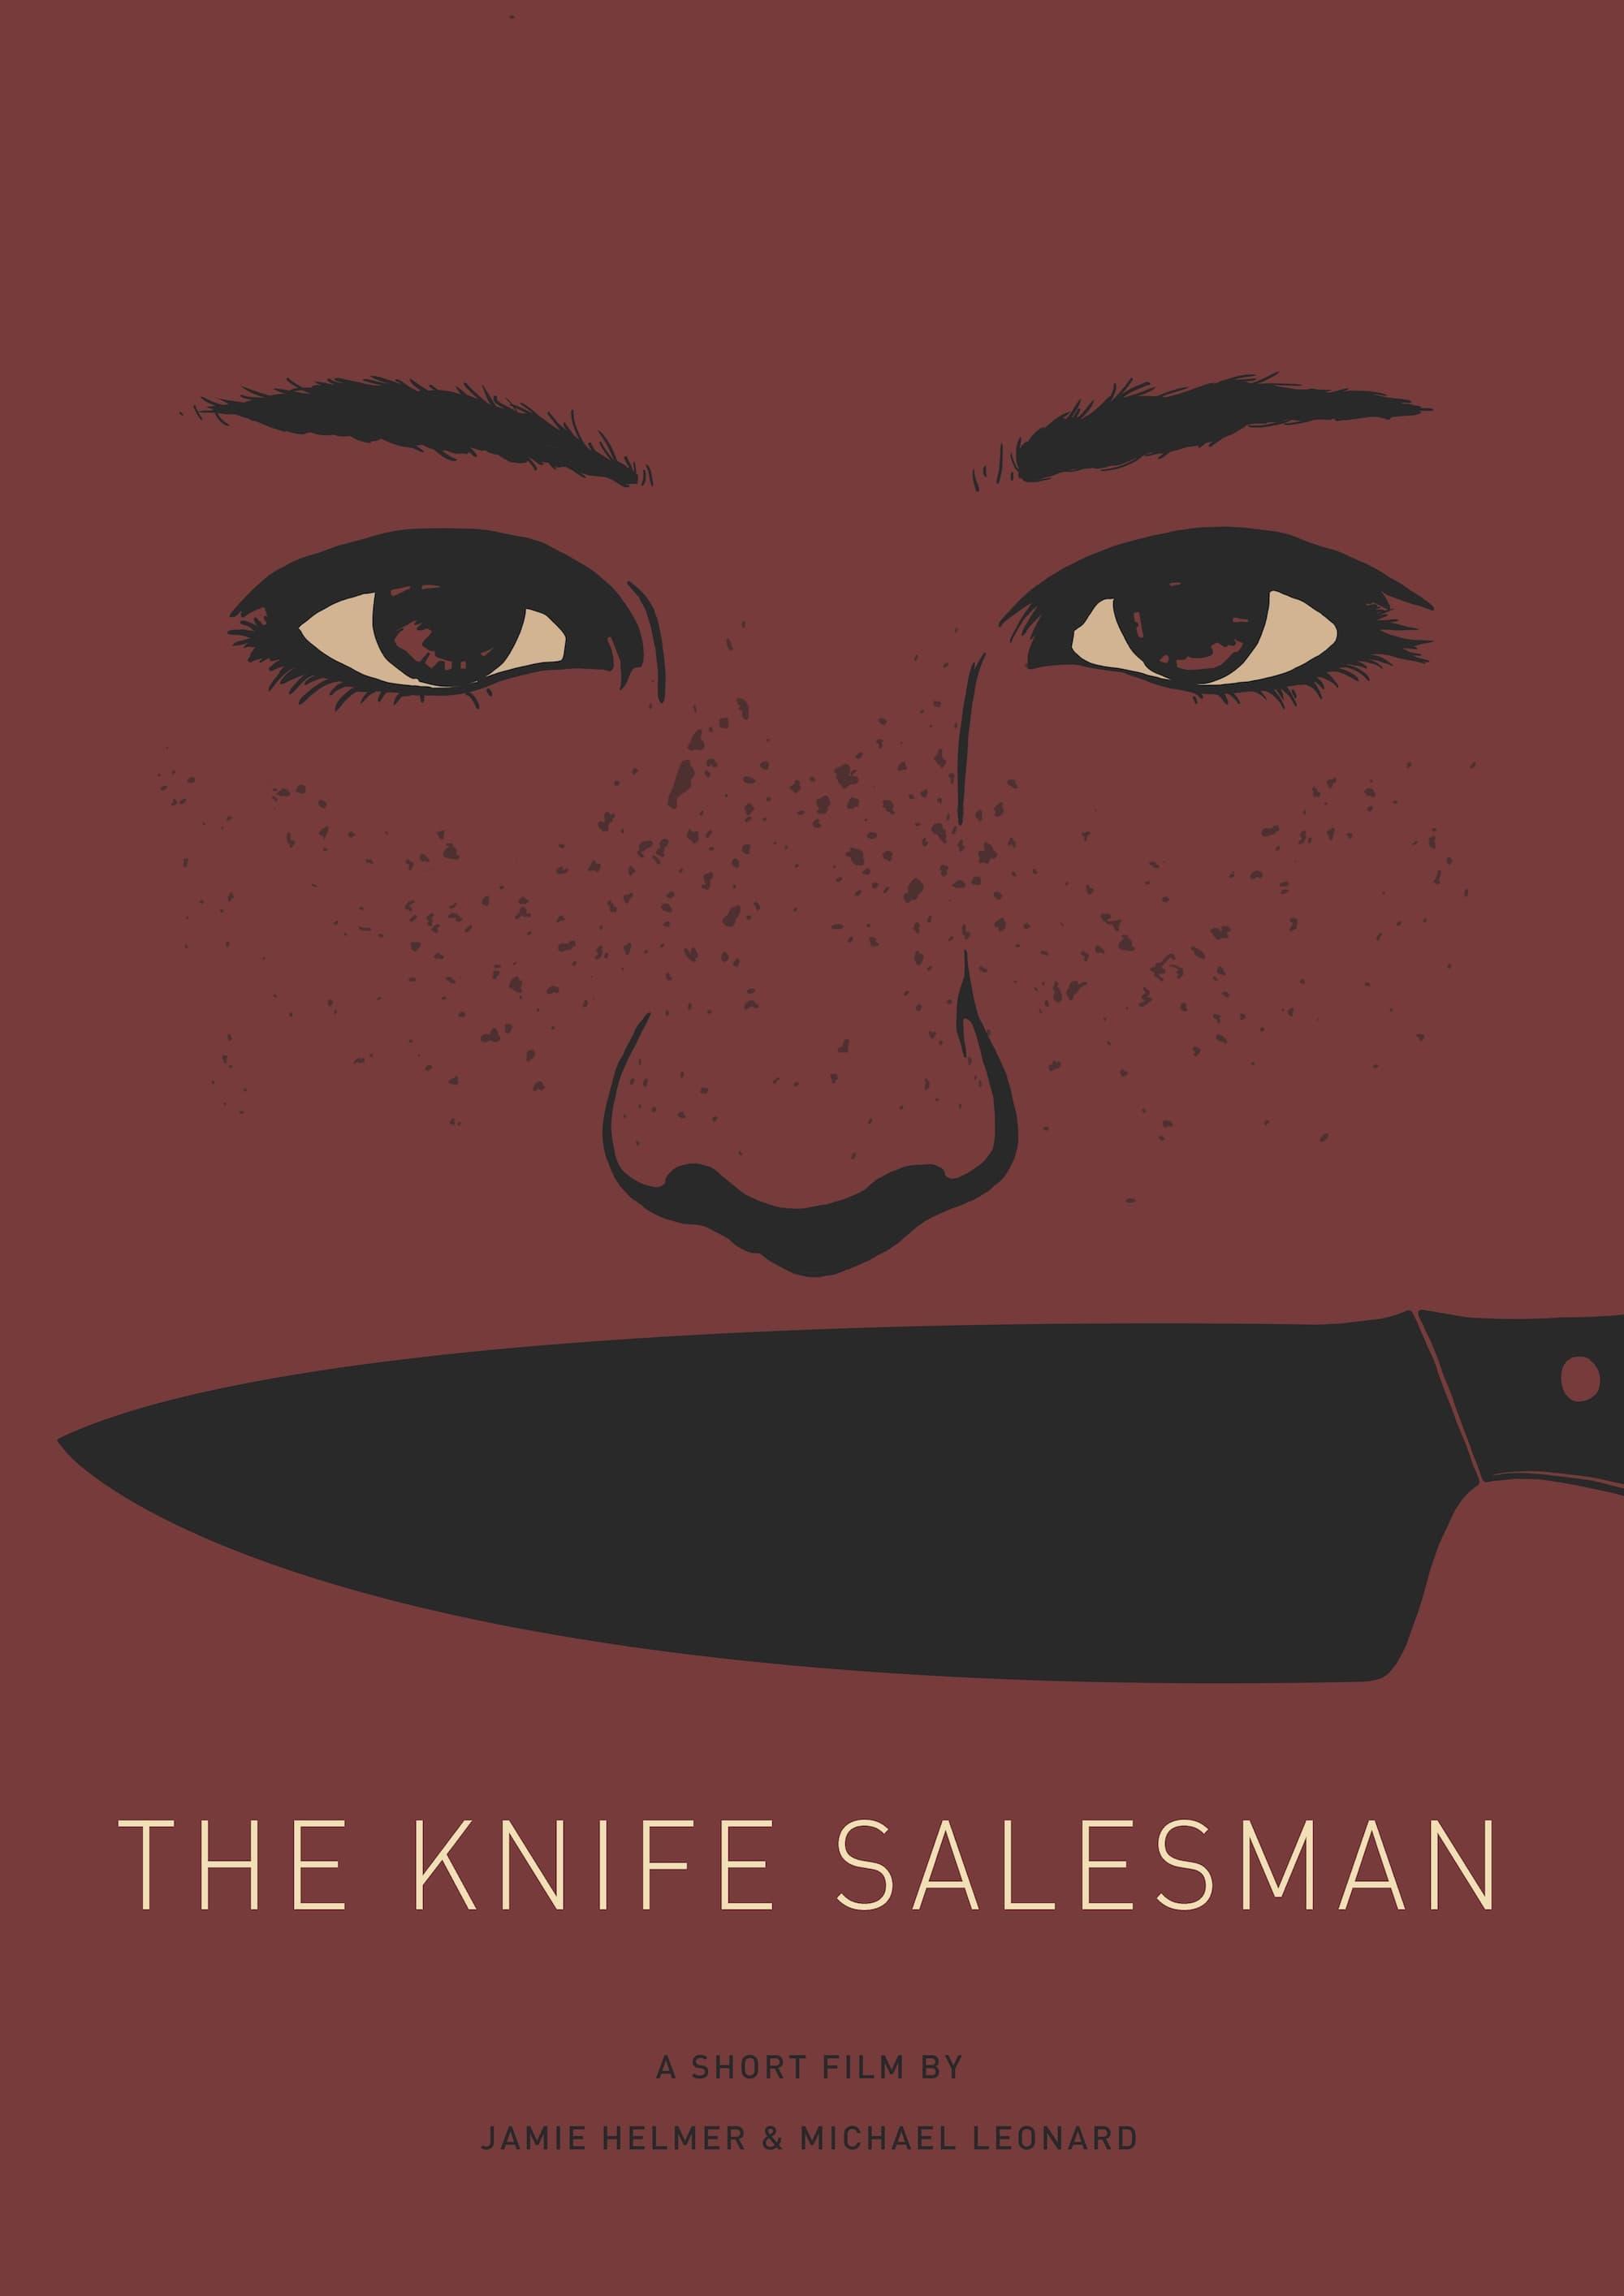 The Knife Salesman (2017)